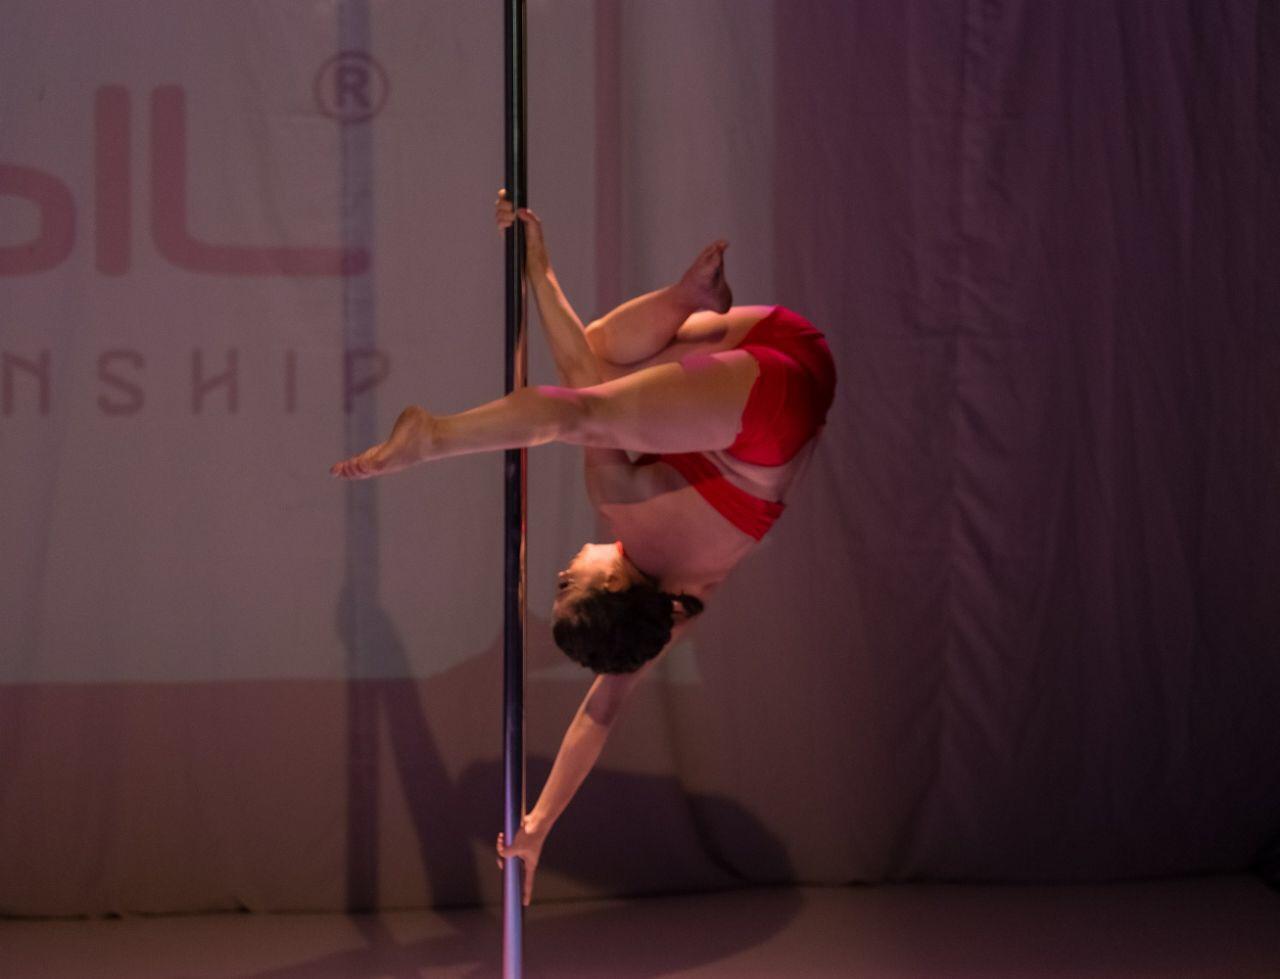 campeonato pole dance brasil